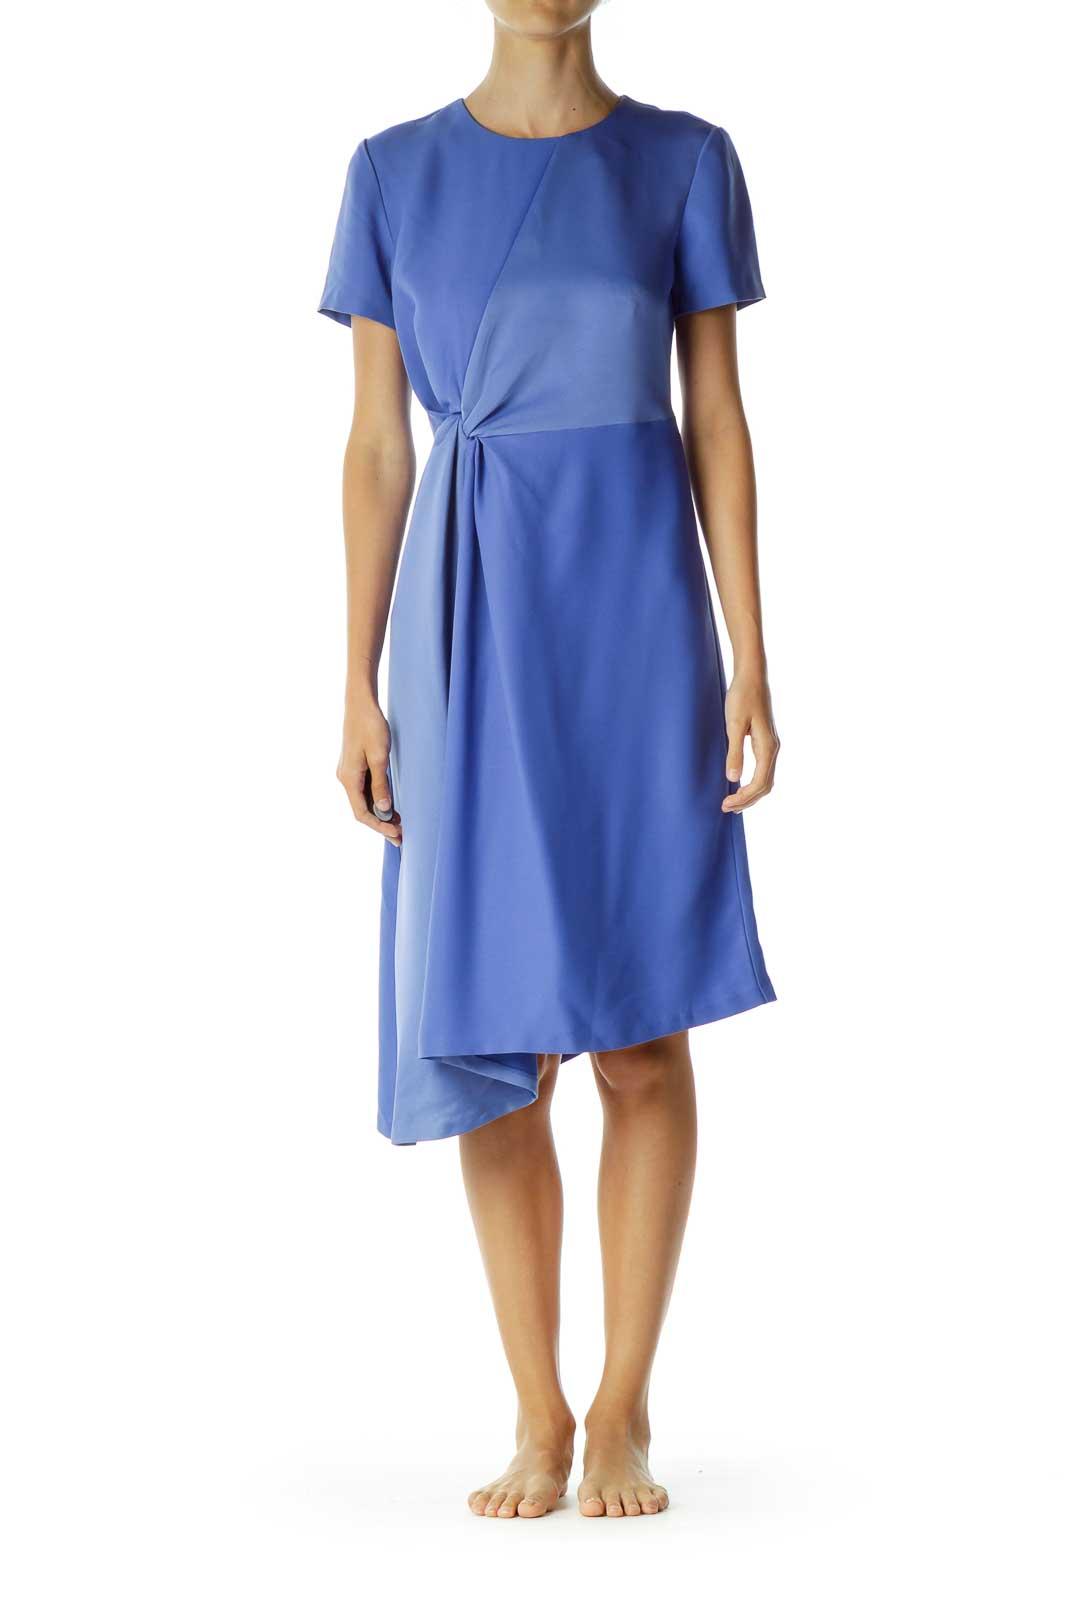 Blue Scrunched Midi Work Dress